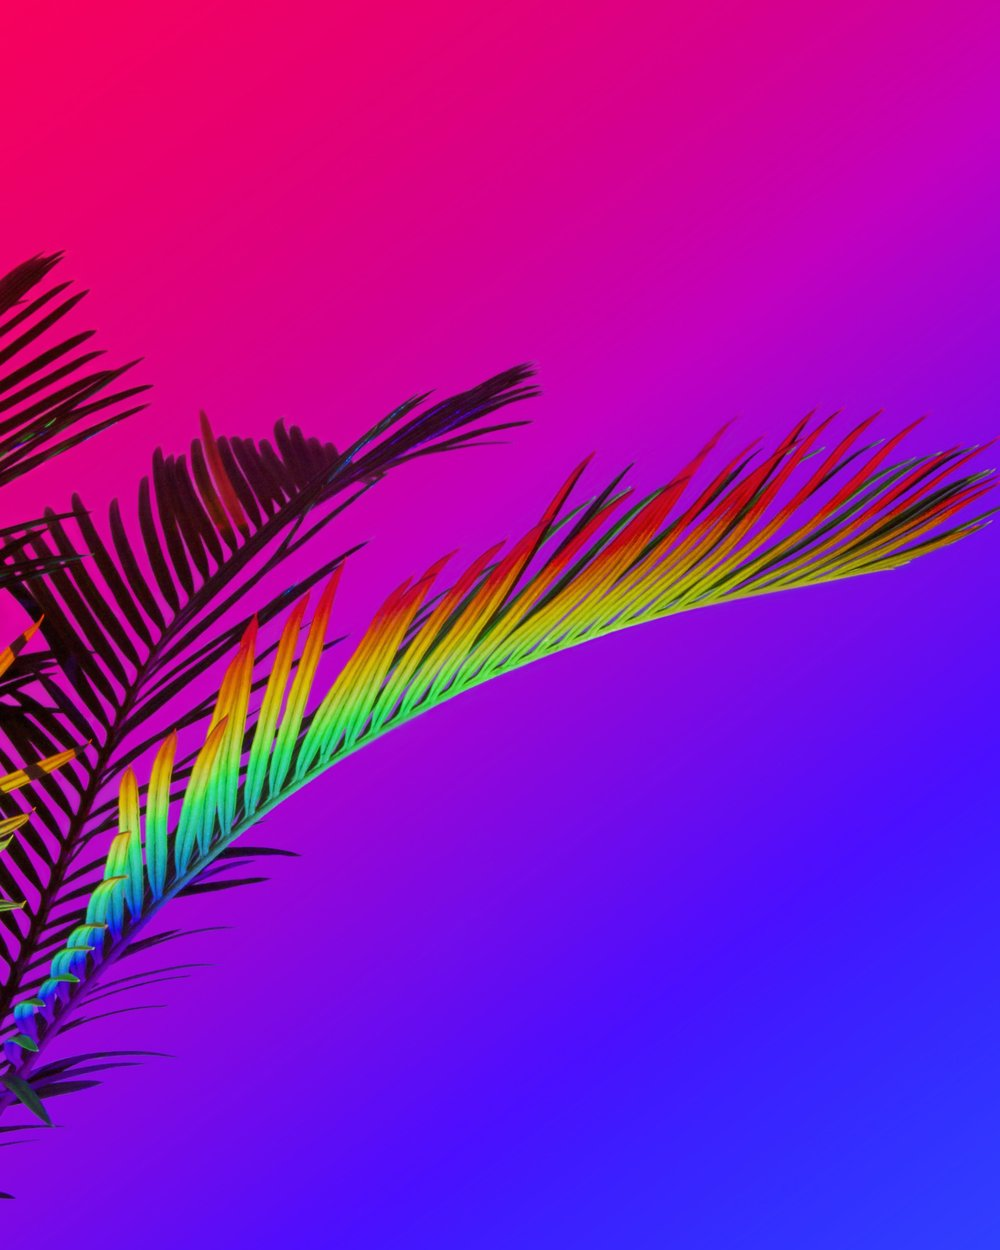 Signe_Pierce_034_Rainbow_Palm_76x61cm2015_web.jpg